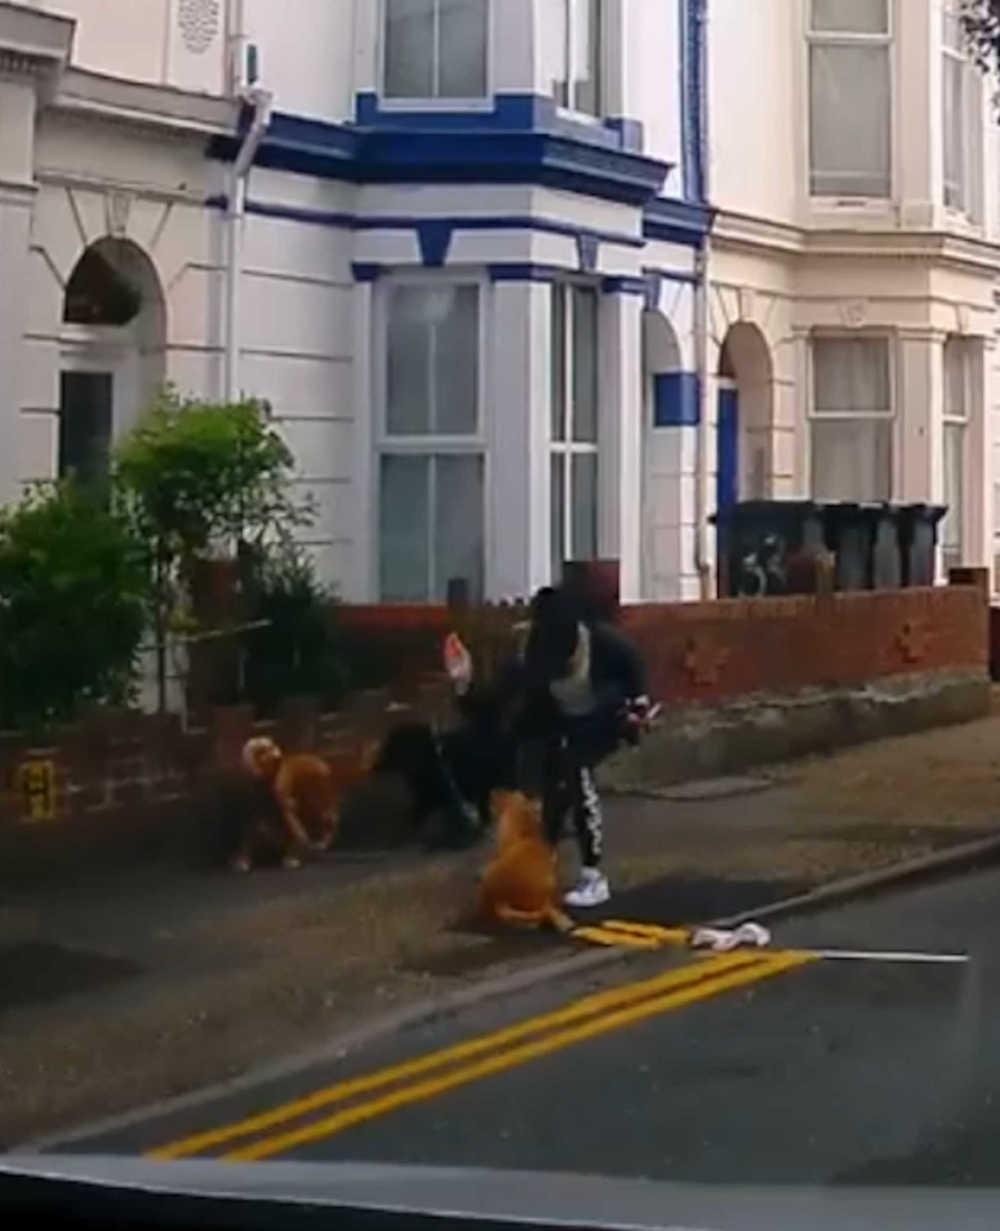 Woman hitting dog